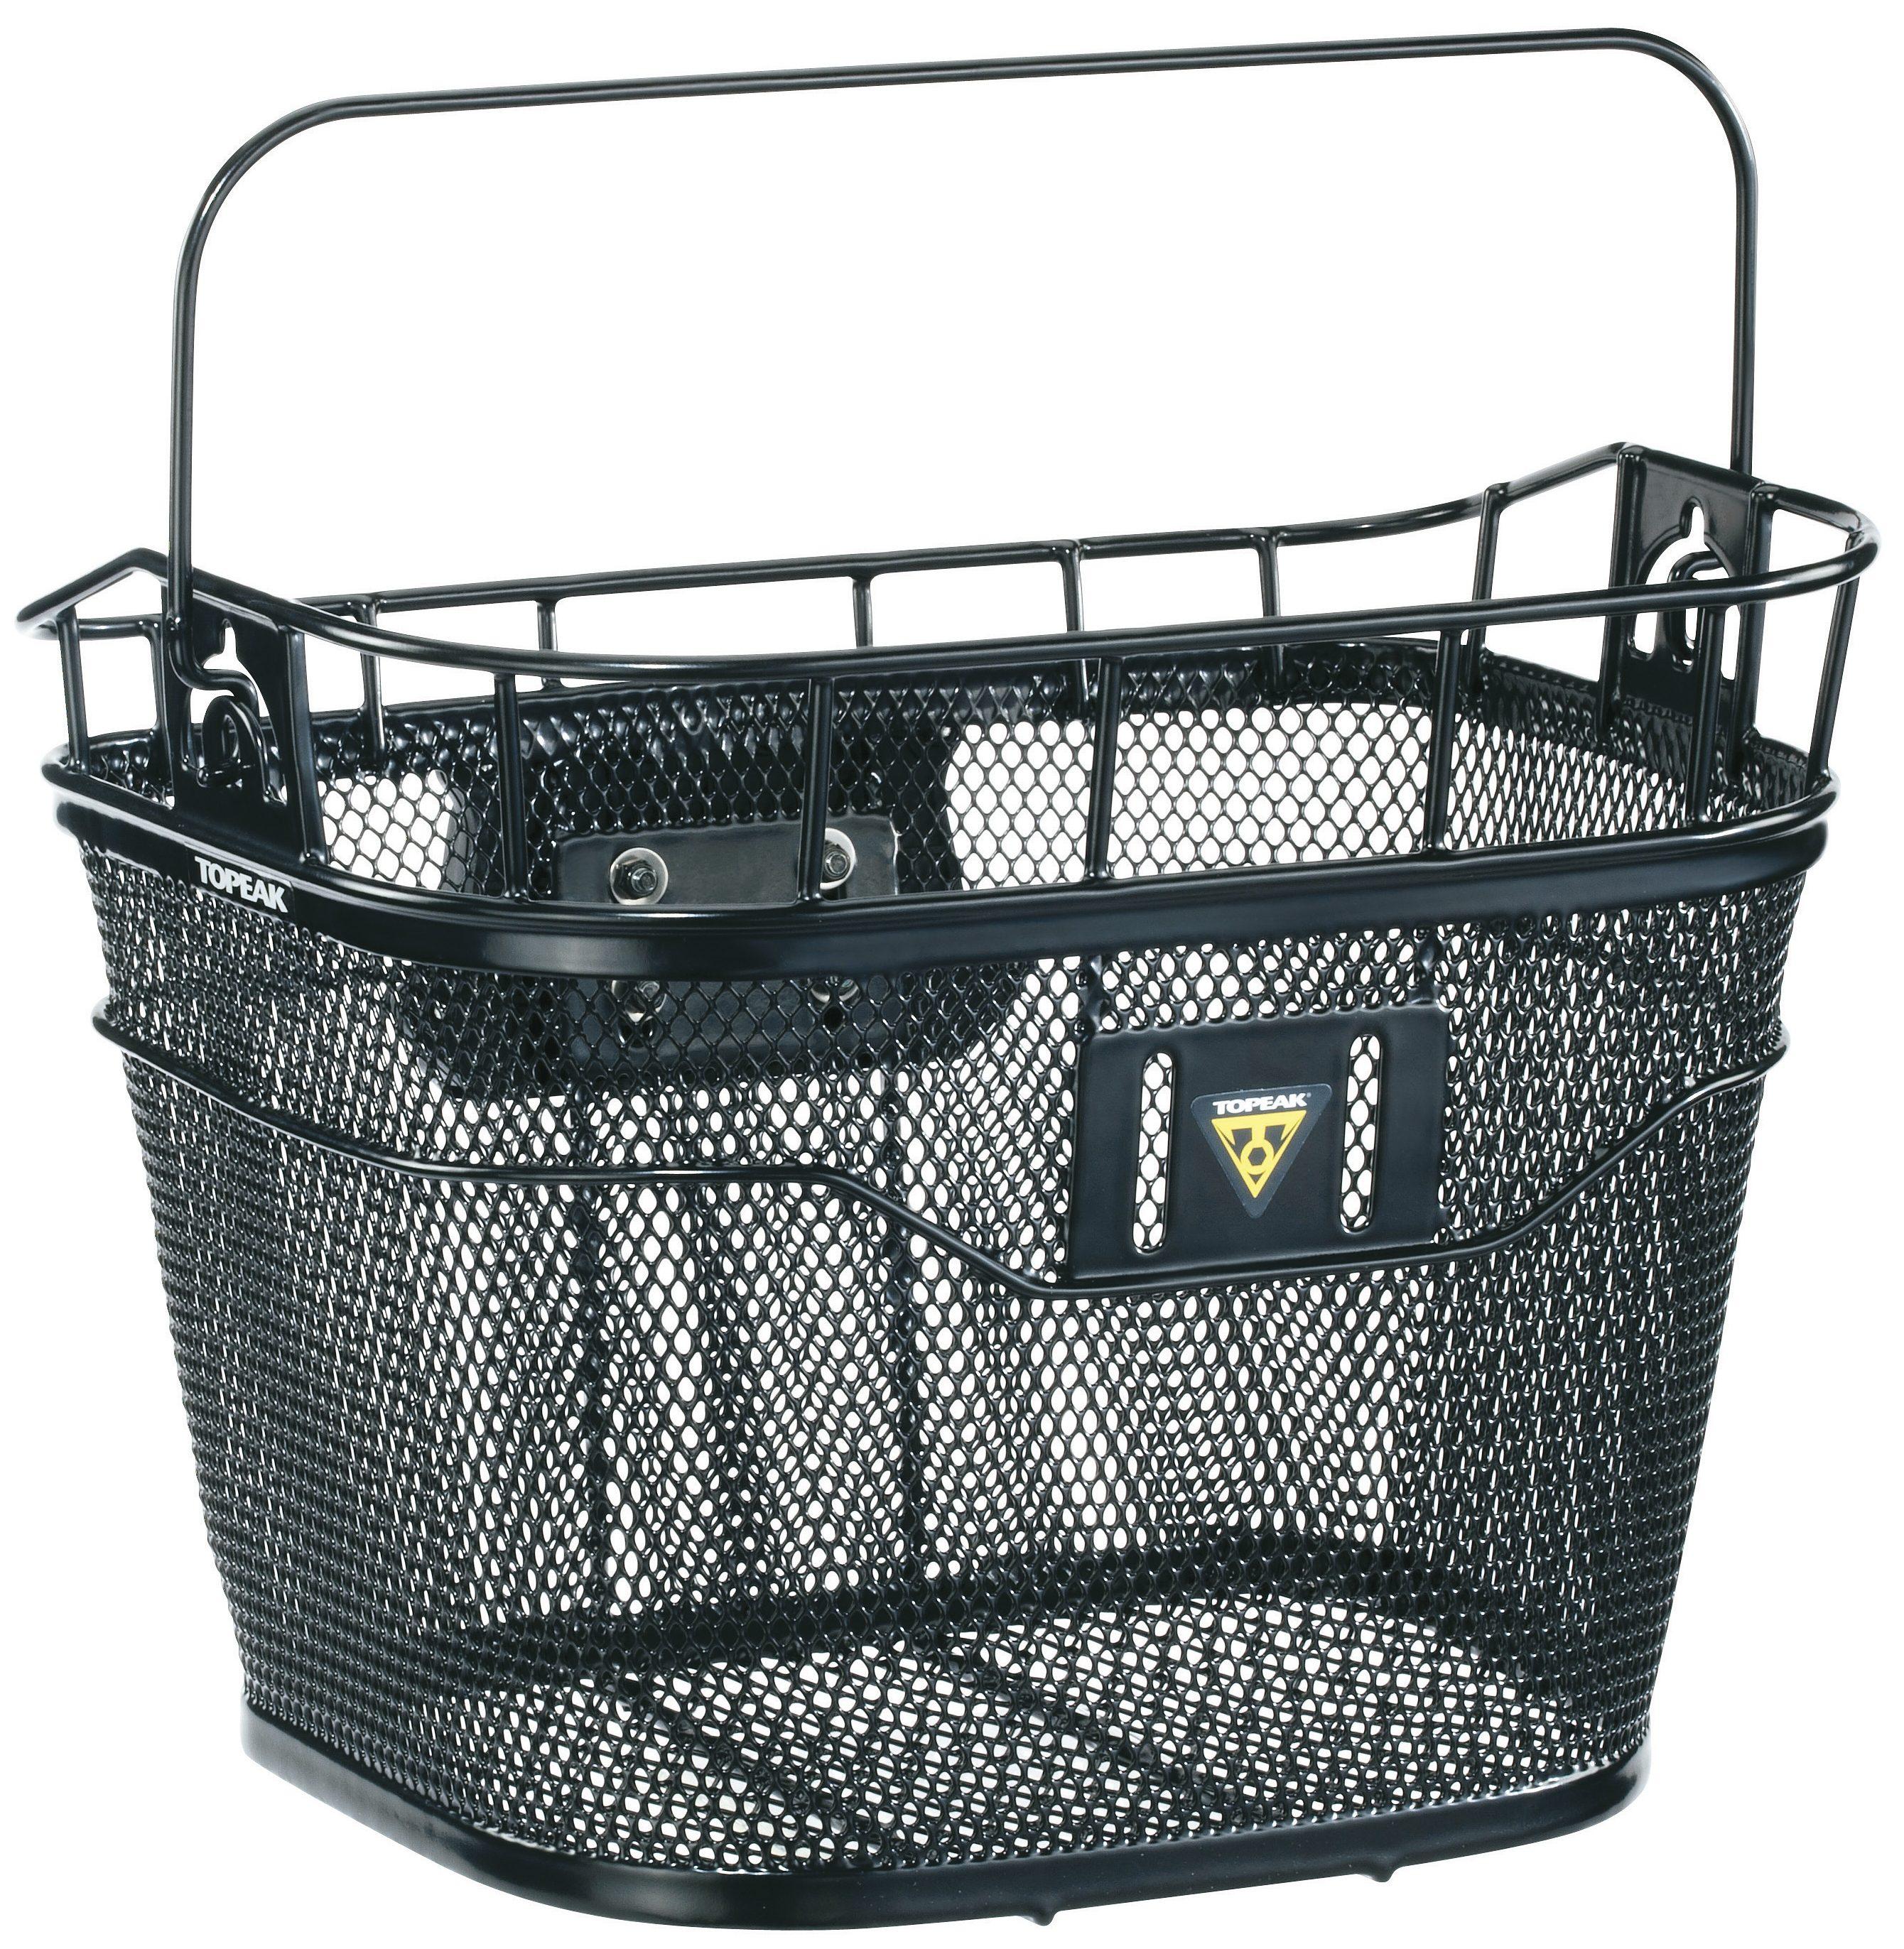 Topeak Fahrradkorb »Basket«